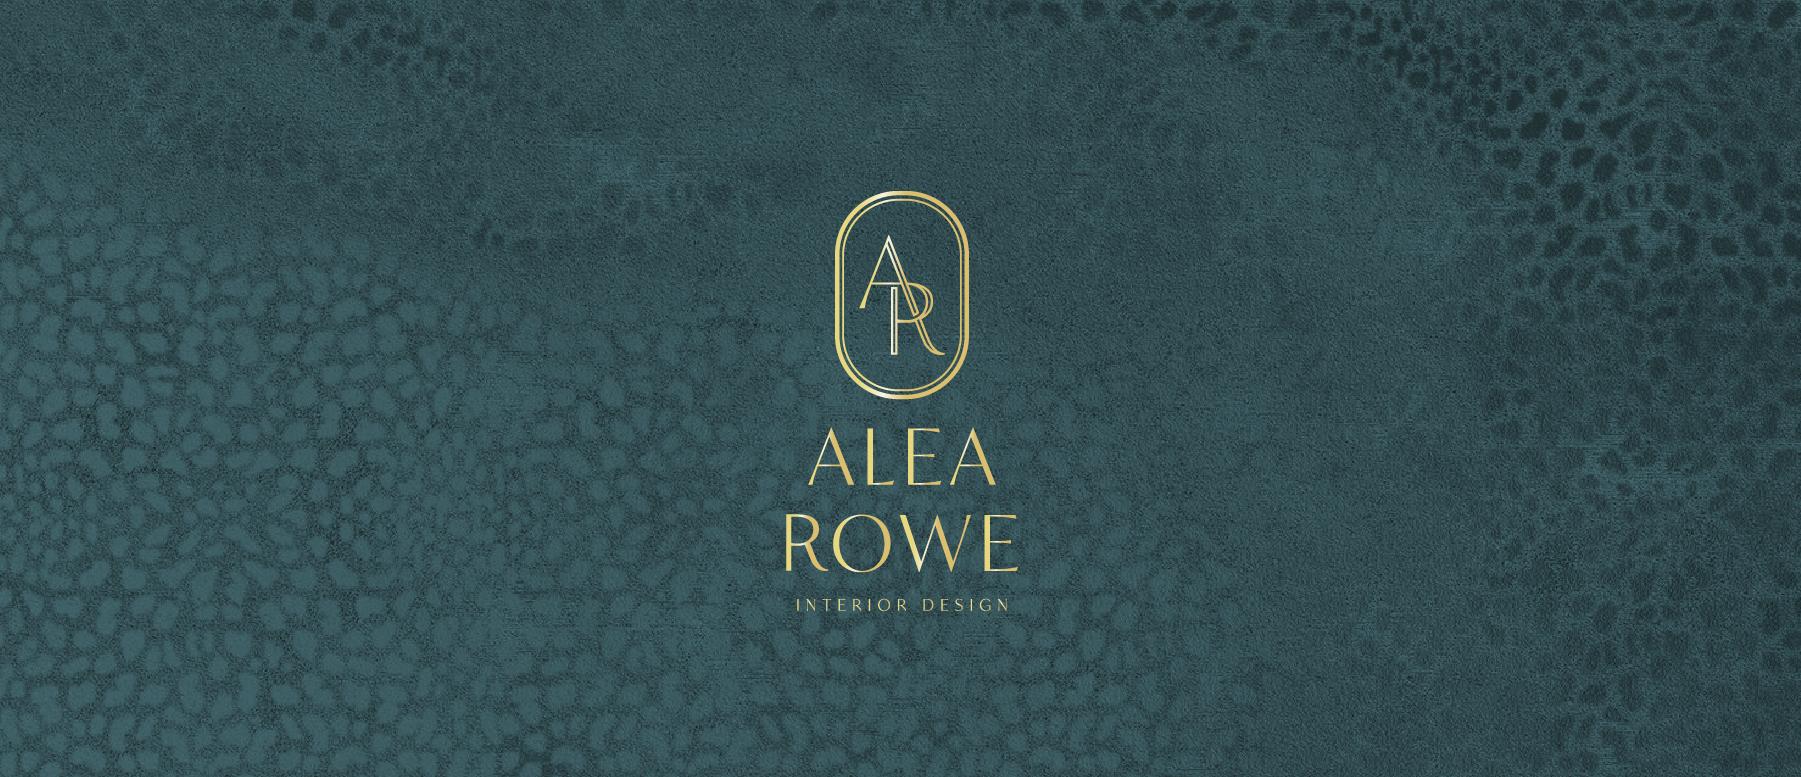 alea_rowe-05.jpg